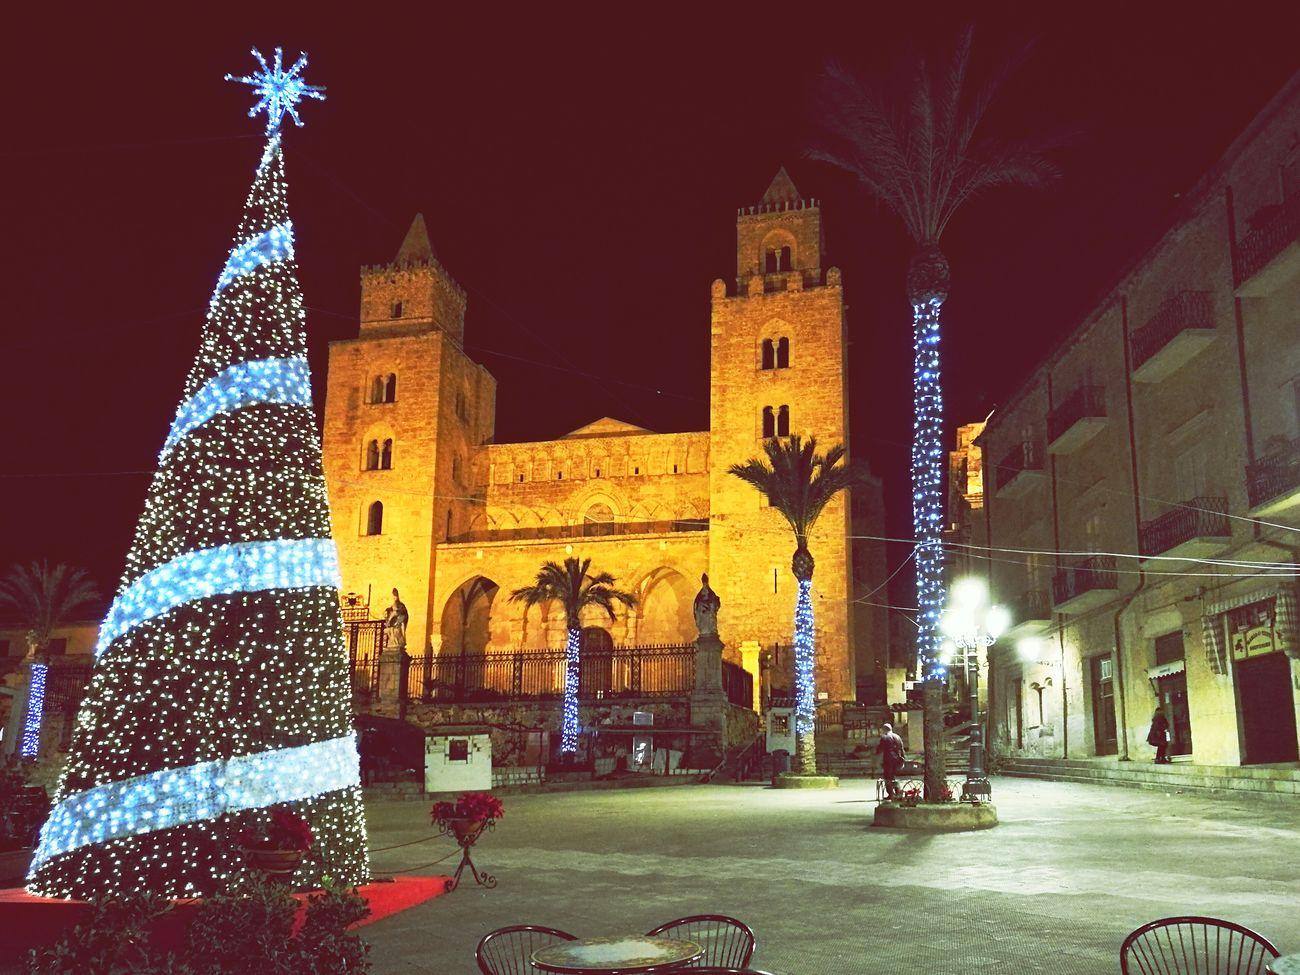 Scenics Square Cristmas Cathedral Catholic Church Cefalú, Sicilia, Mare, Paesaggio Outdoors Xmas Decorations Travel Destinations